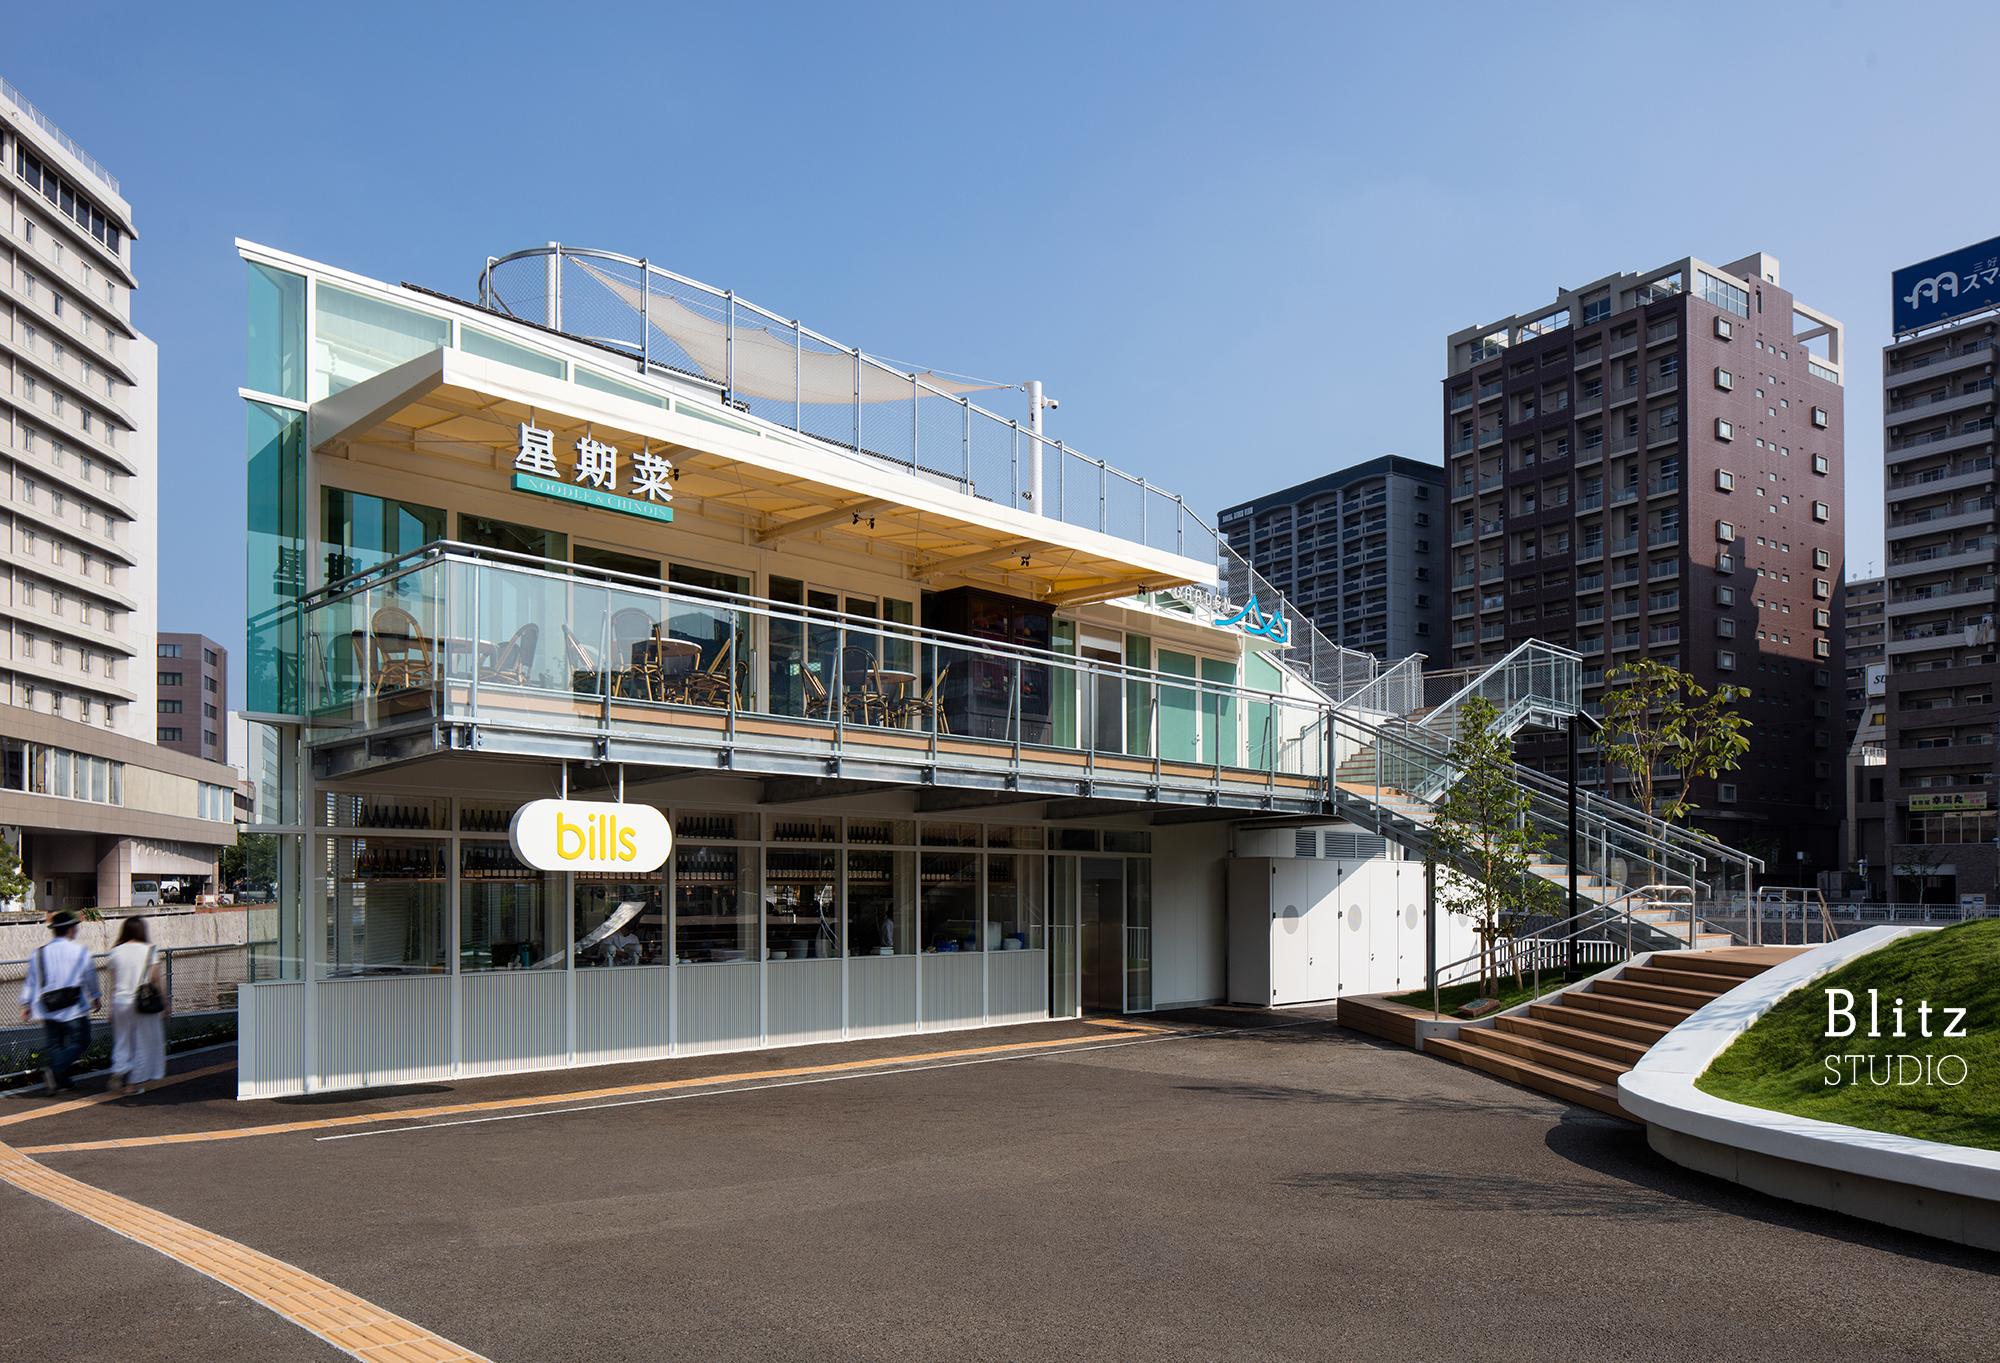 『星期菜 NOODLE & CHINOIS』-福岡県福岡市-建築写真・竣工写真・インテリア写真1